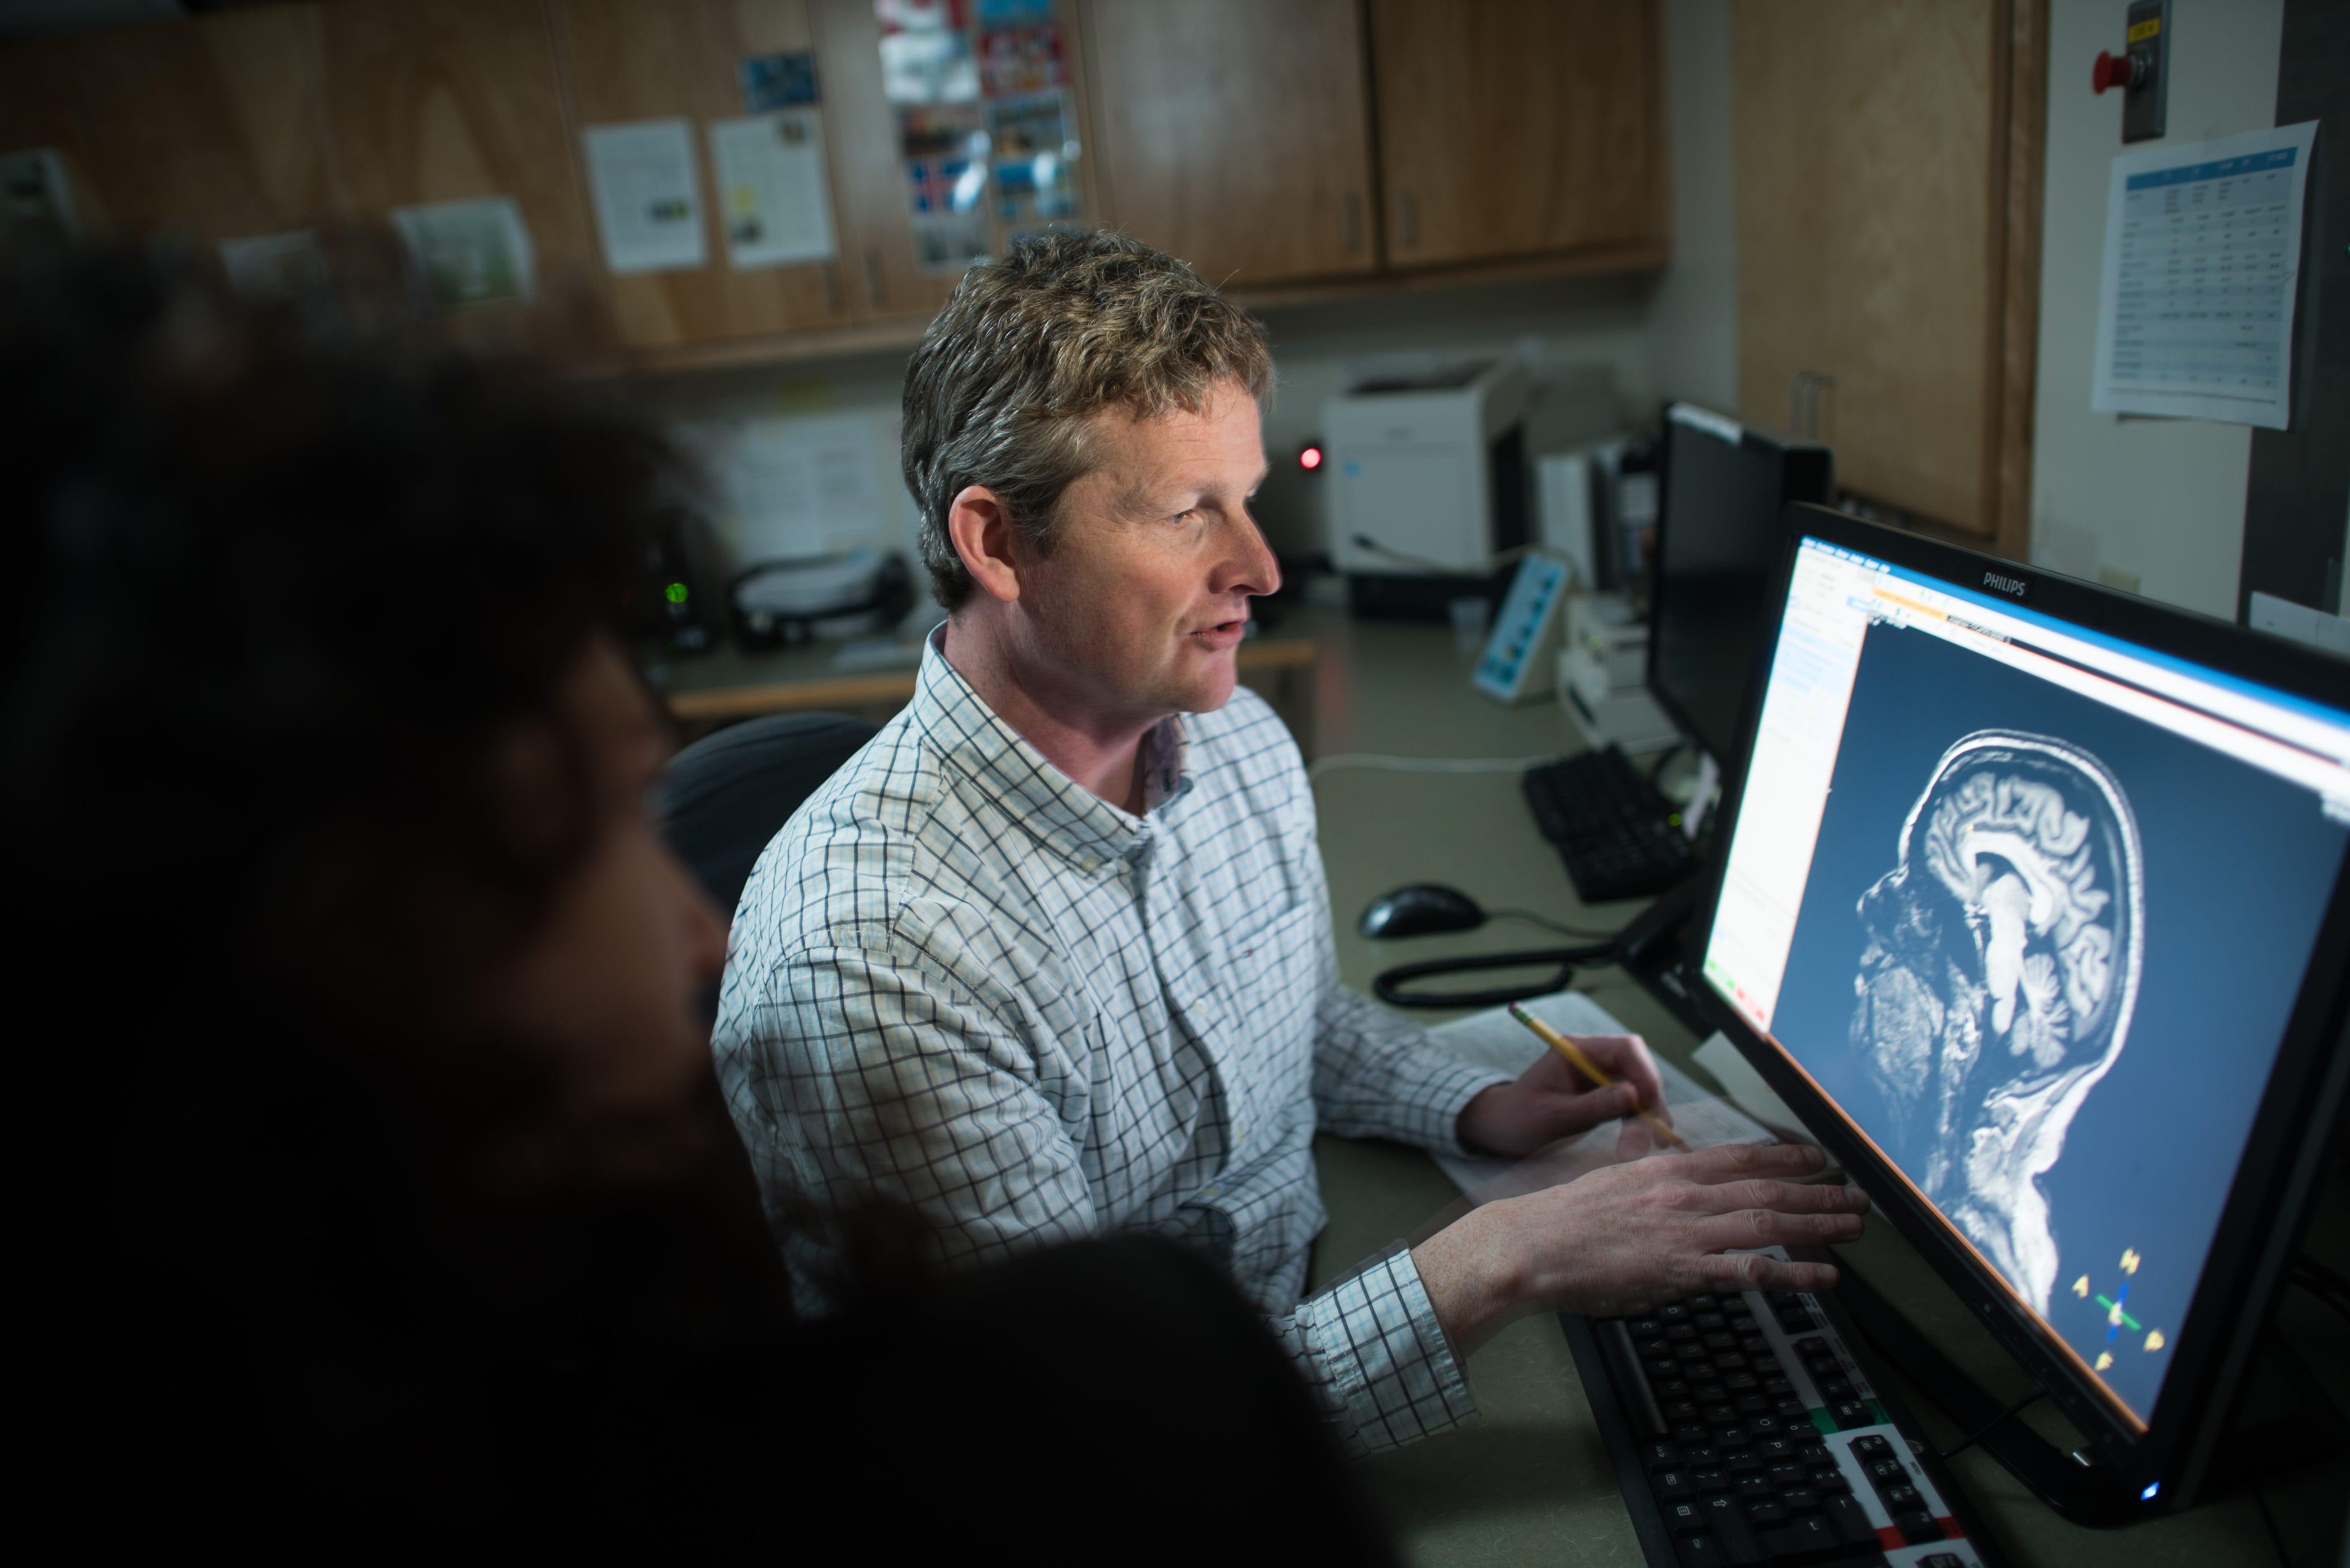 University of Vermont Professor of Psychiatry Hugh Garavan observes a brain scan in an undated university photograph.